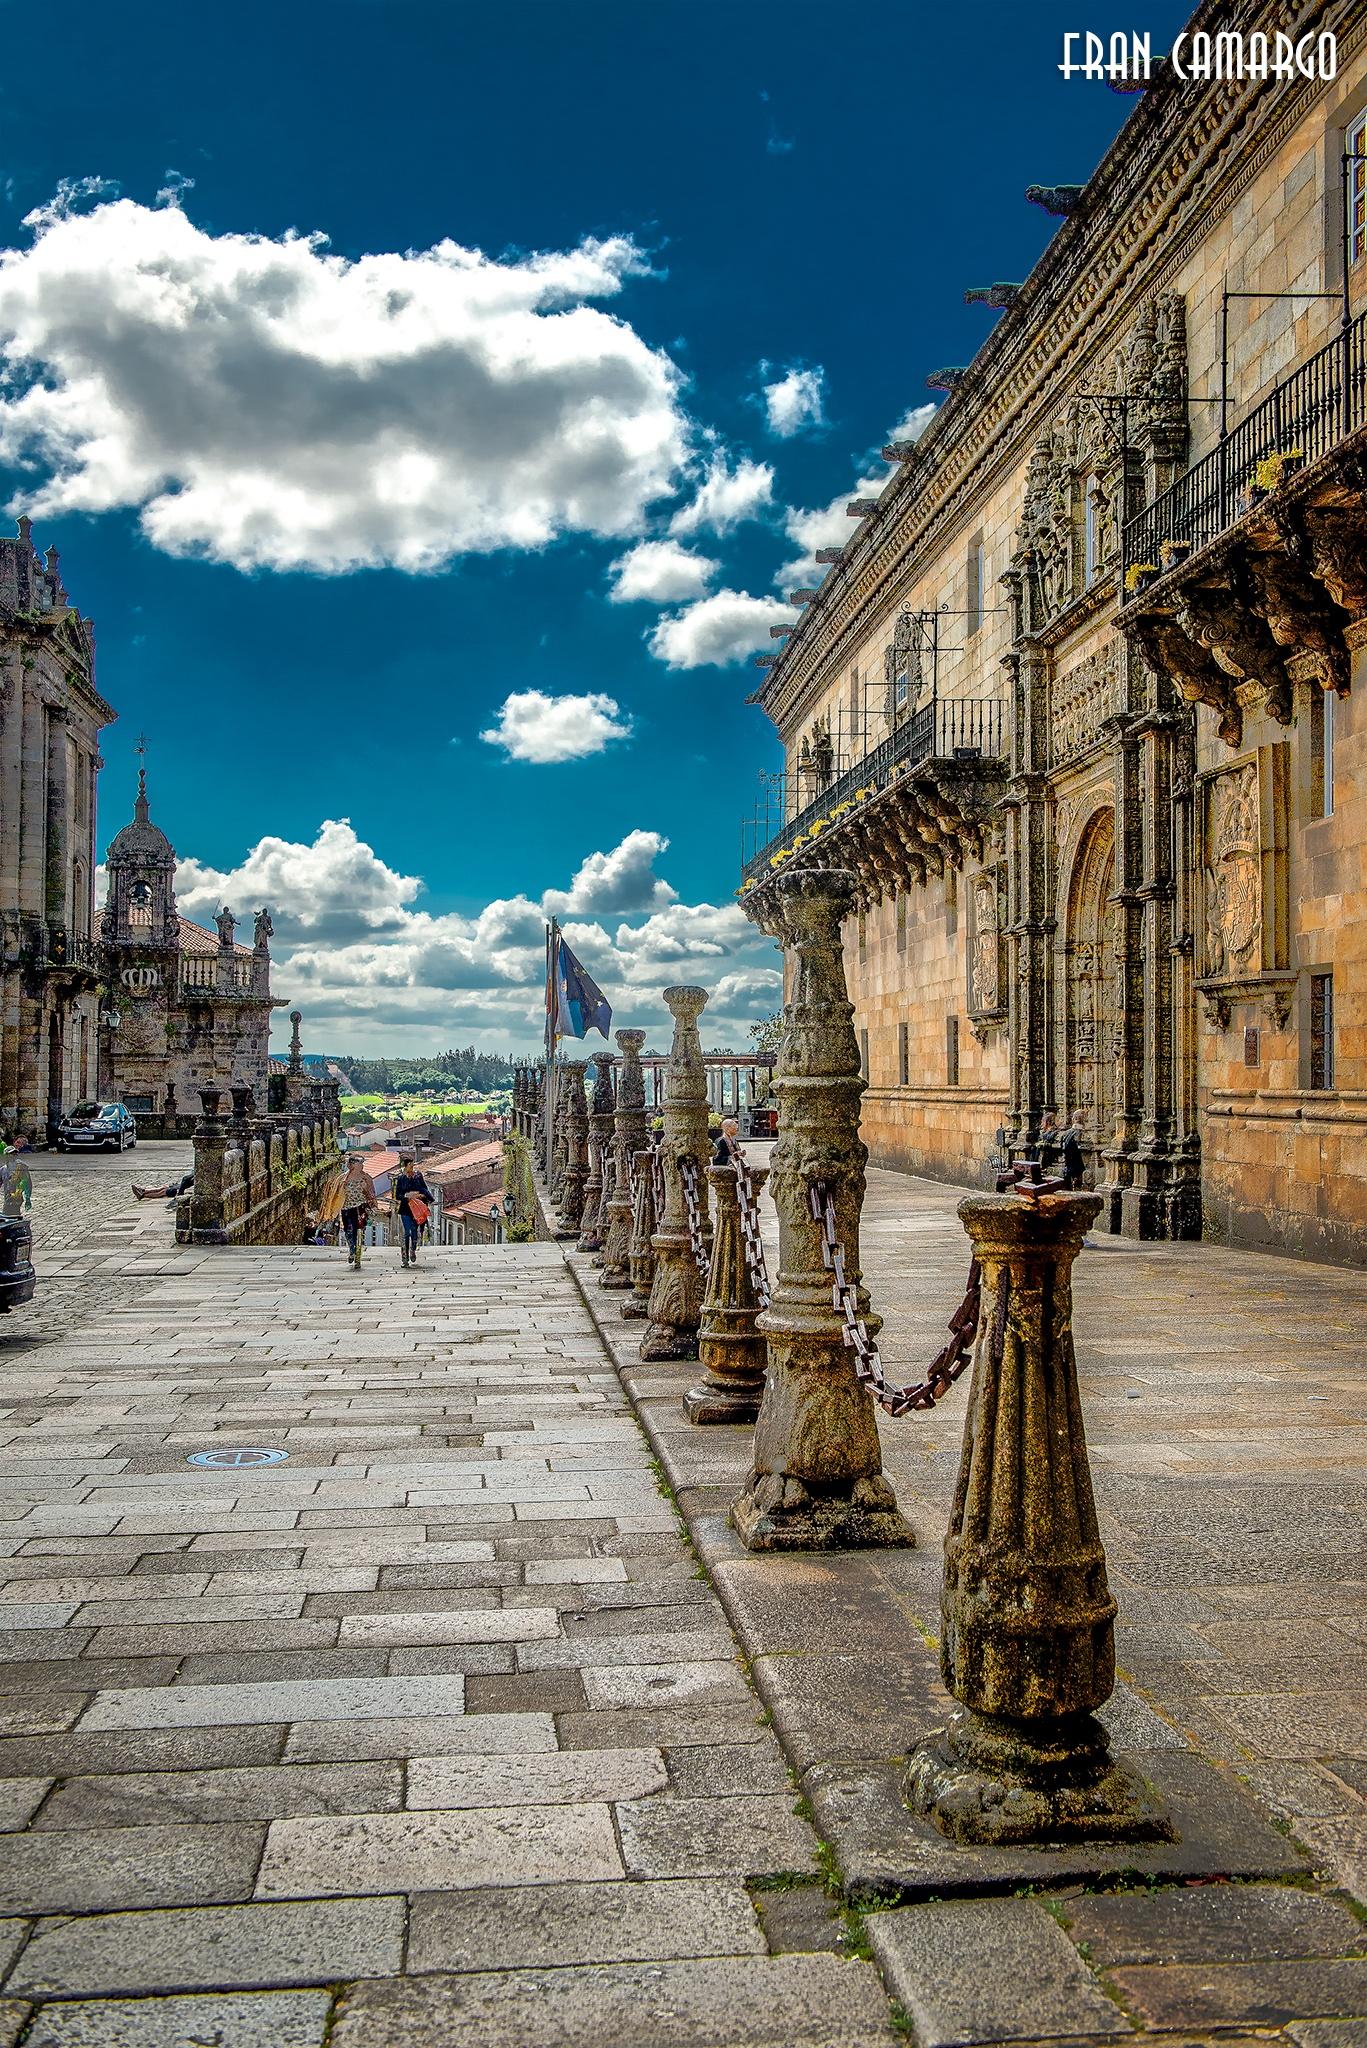 Santiago de Compostela by Fran Camargo